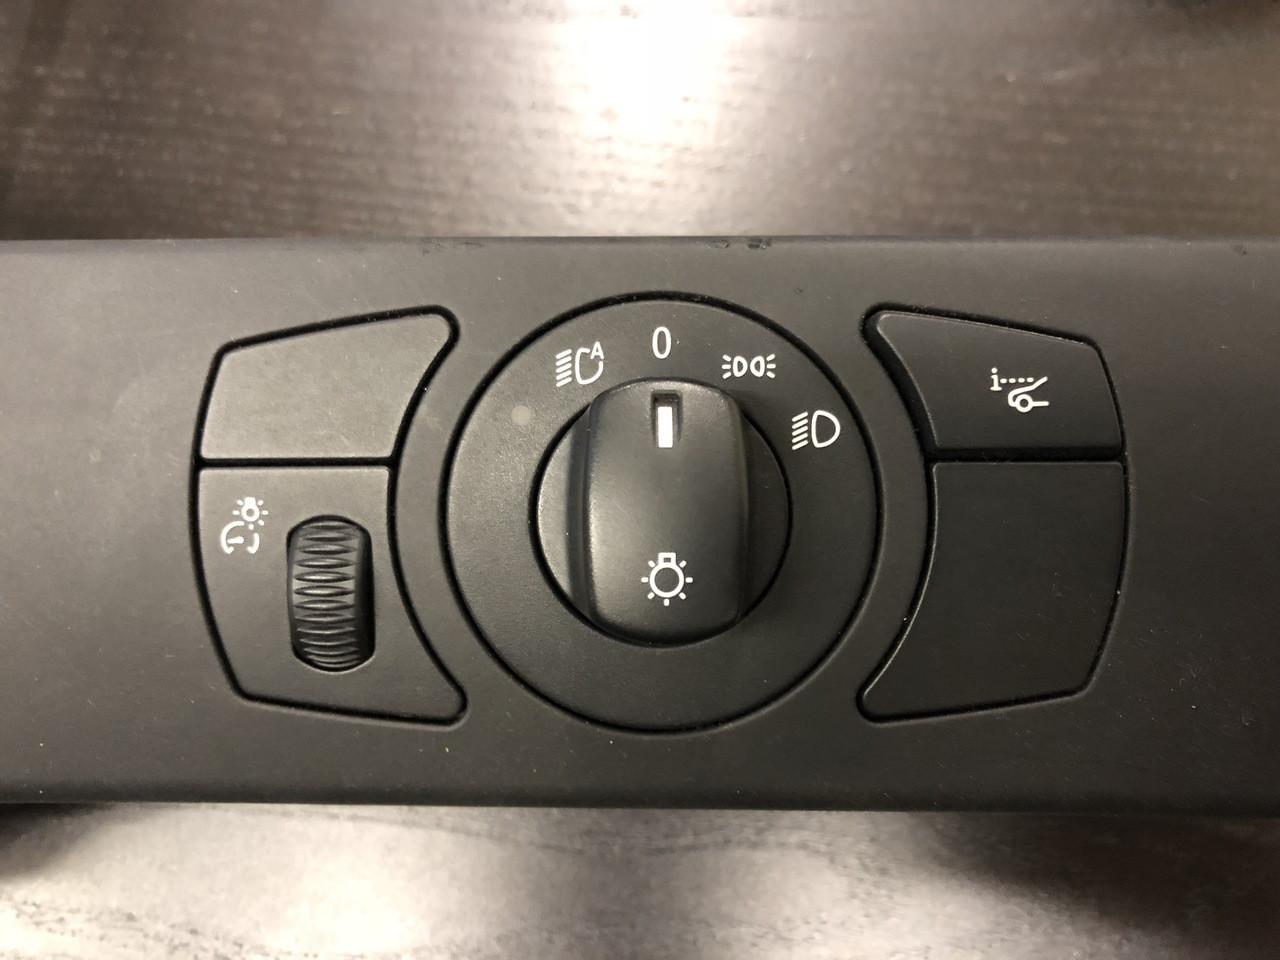 E60 5 Series M5 headlight switch